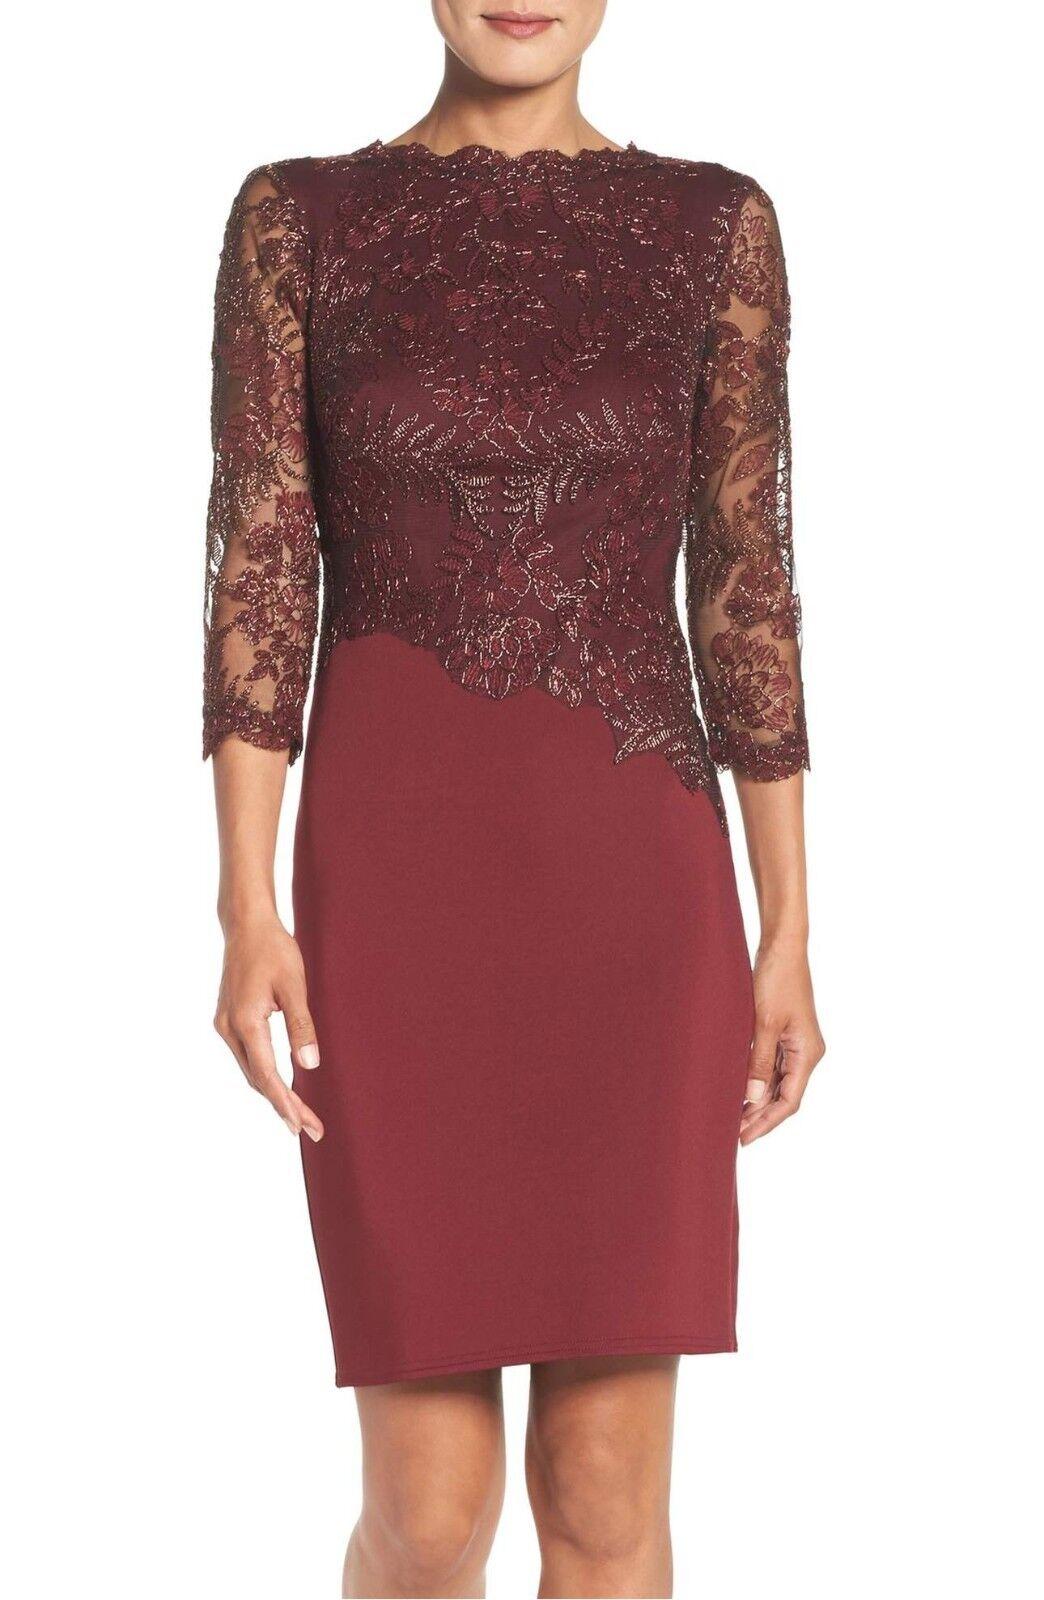 Newtadashi shoji lace sheath red dress size 2